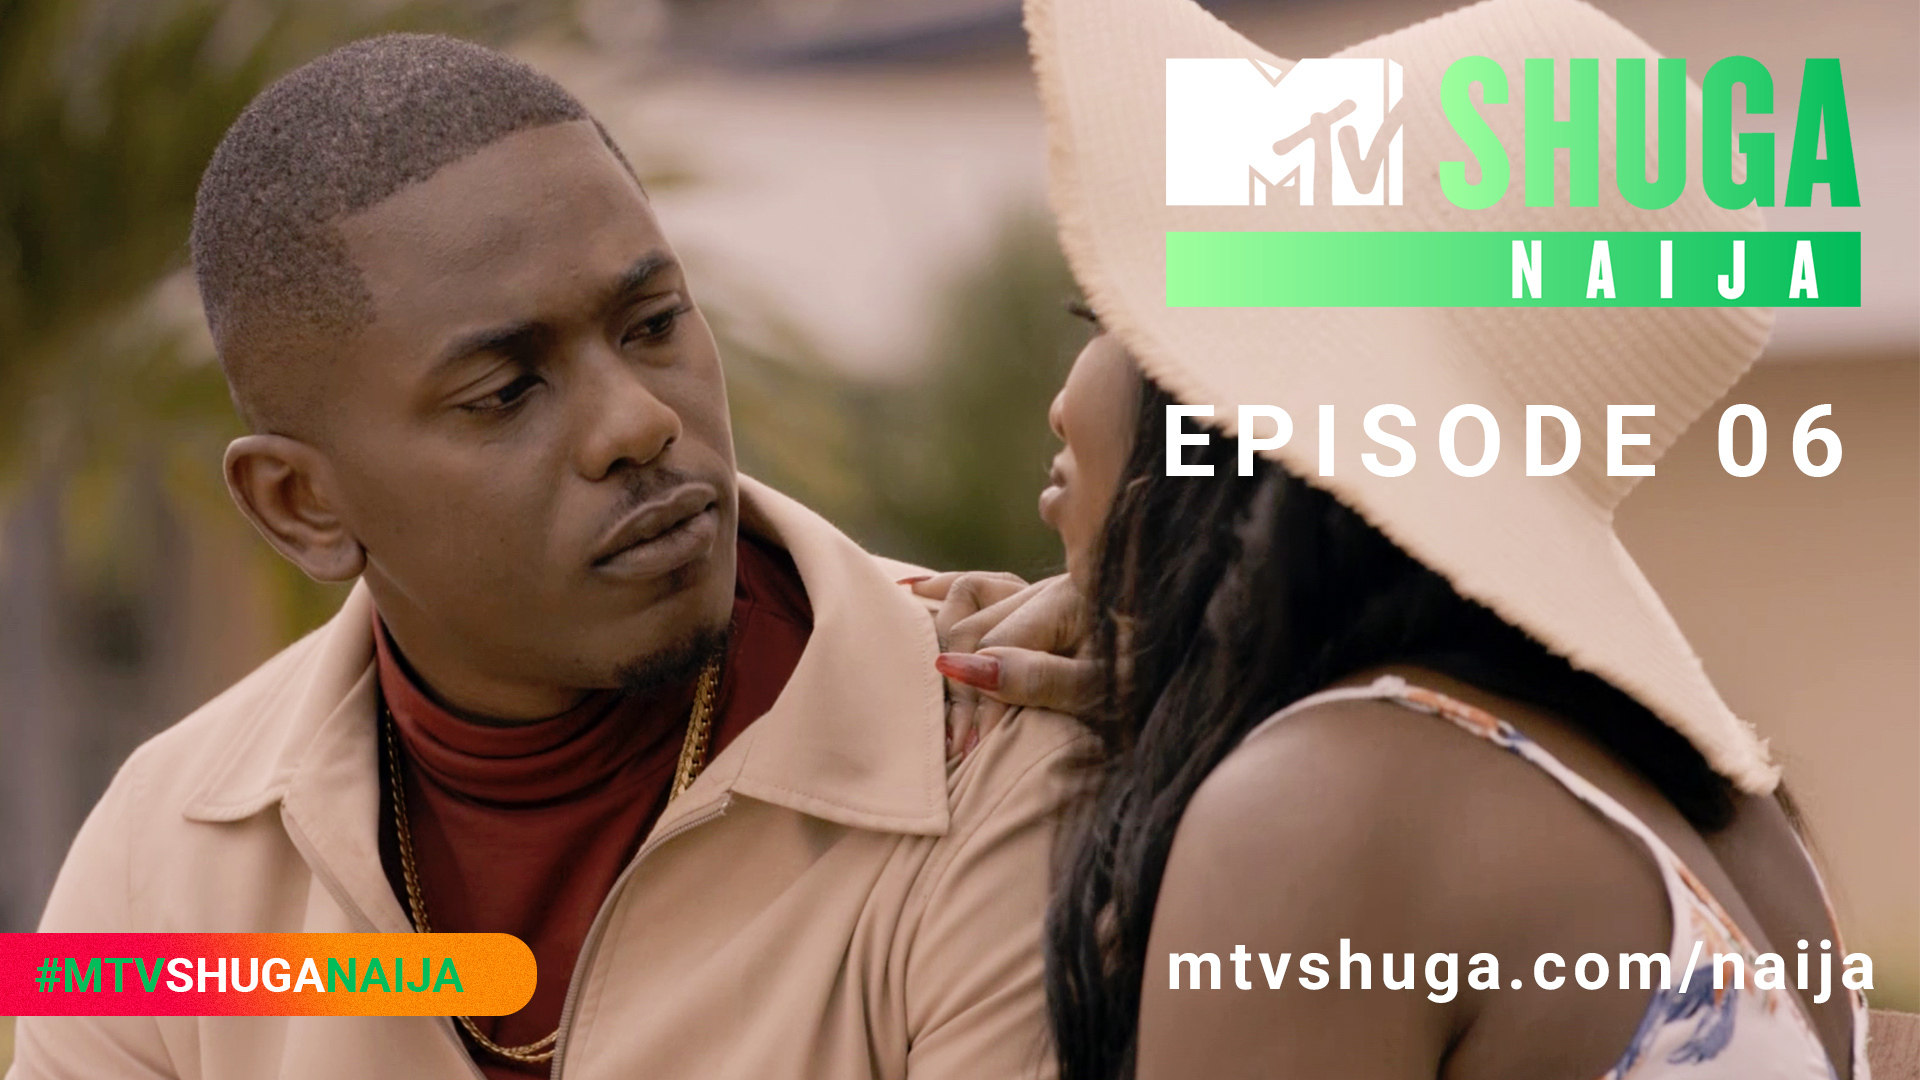 MTV Shuga Naija Episode 6: Tobi And Diana's Reckless Sexual Behaviors May Have Finally Caught Up With Them